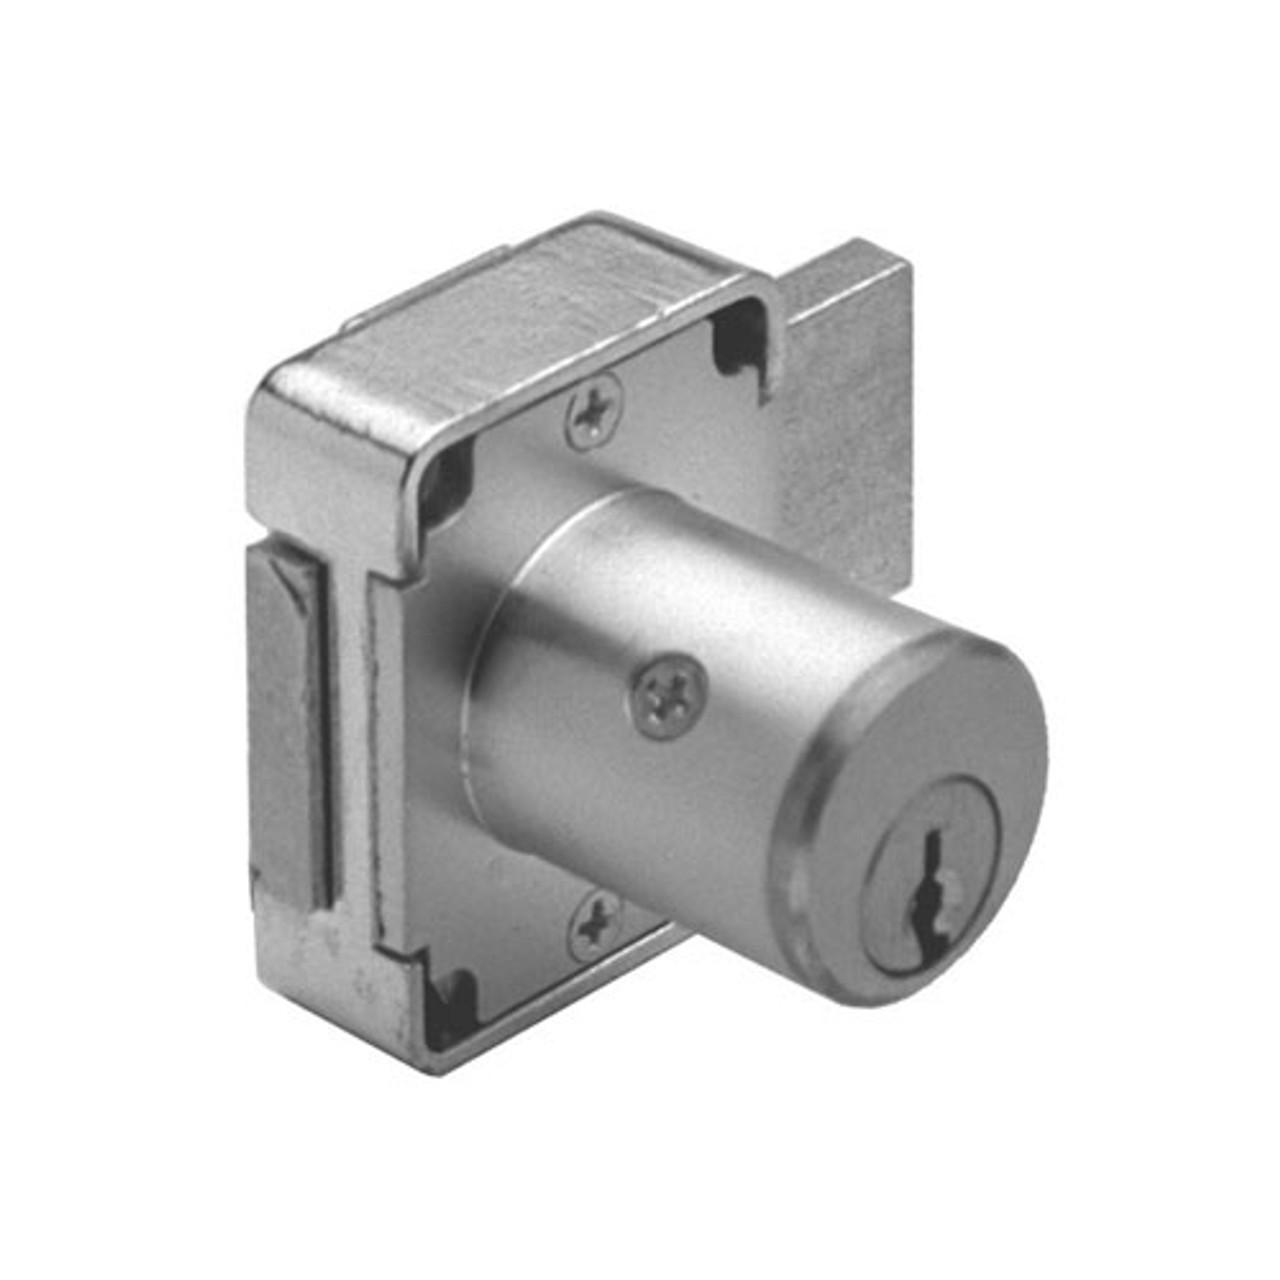 Olympus 500DR-KD-26D-1-3/8 Deadbolt Locks in Satin Chrome Finish